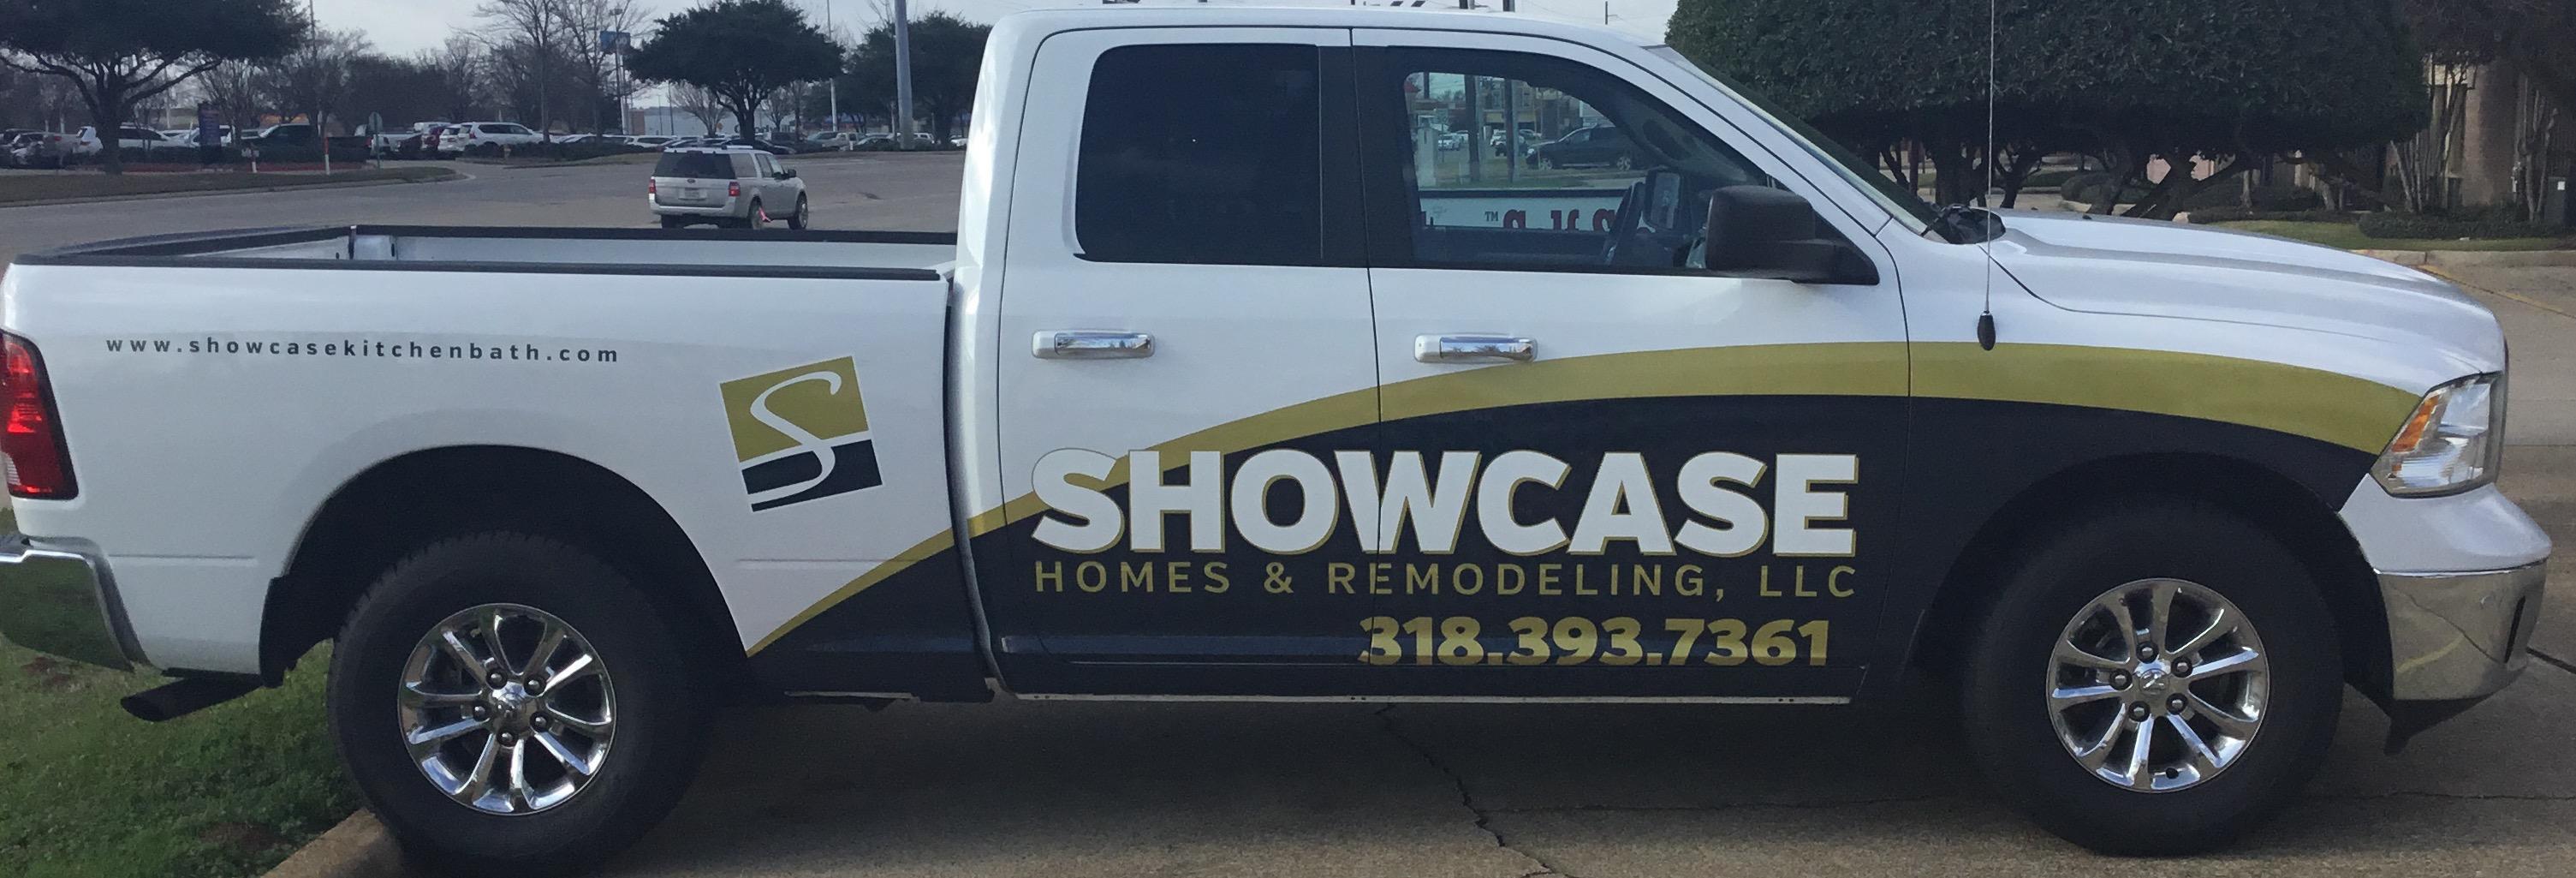 Showcase Homes & Remodeling LLC image 11